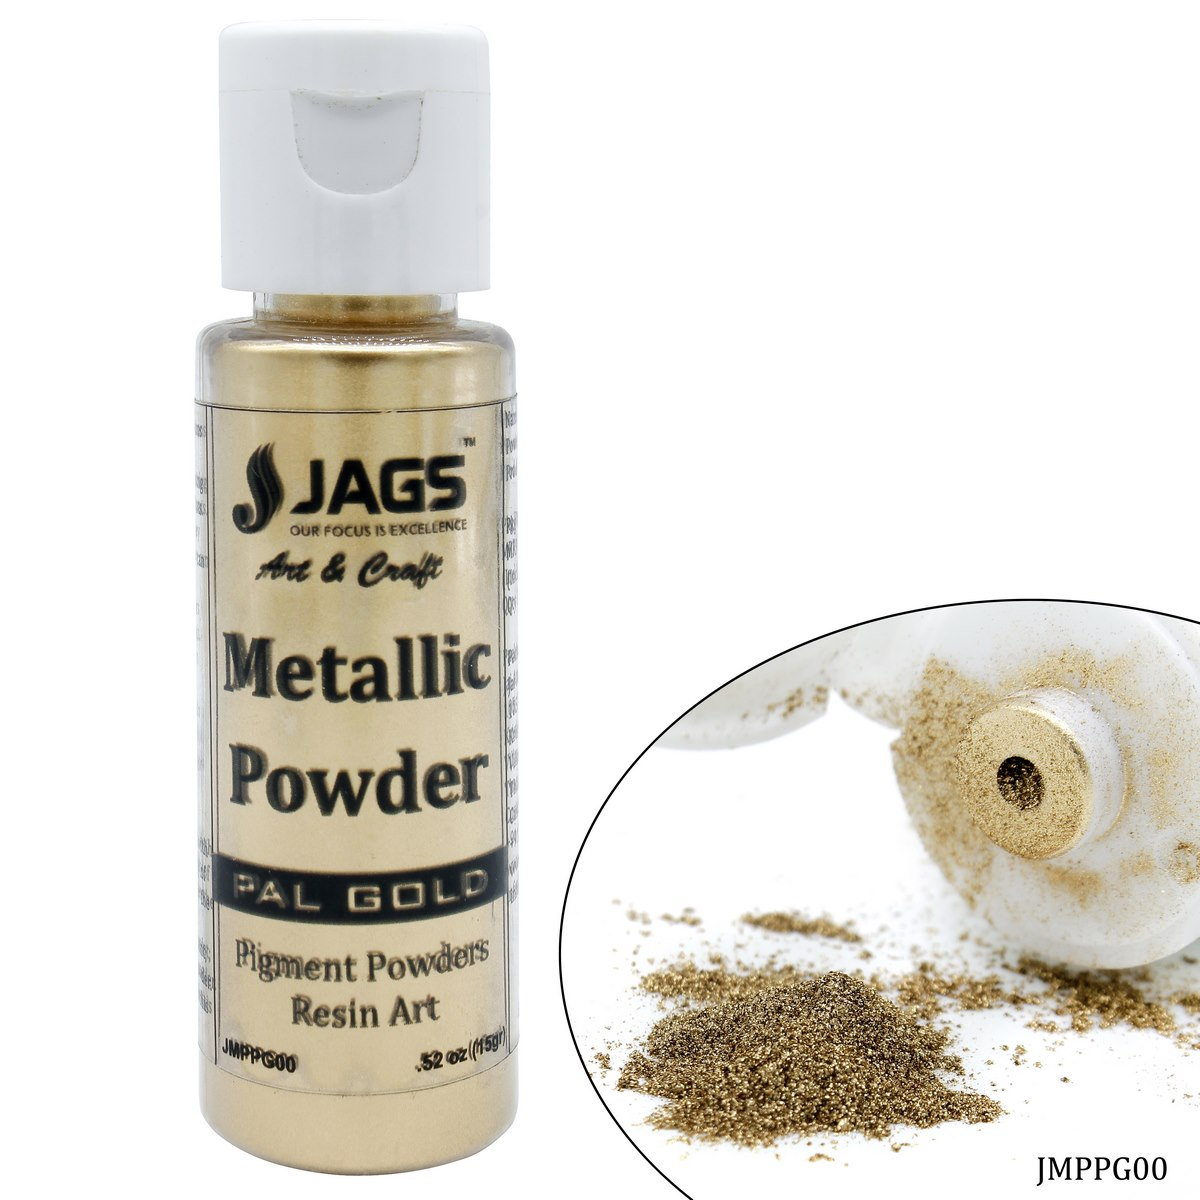 Jags Metallic Powder Pal Gold 15Gms JMPPG00